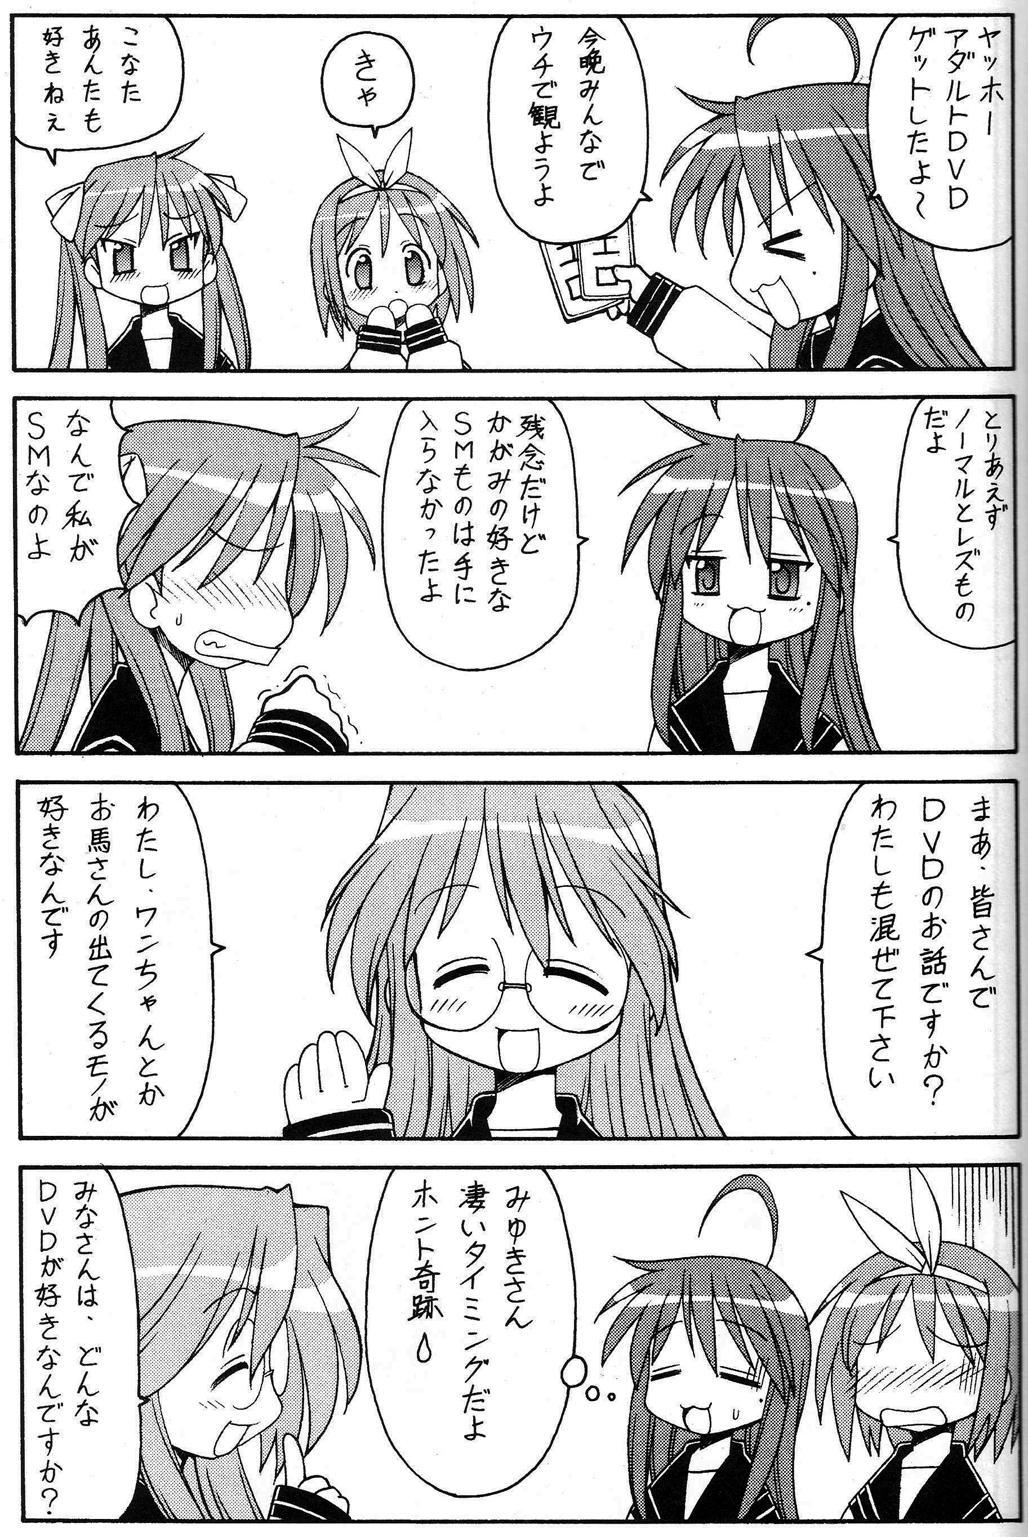 Yatteke! Sailor Fuku 1 27